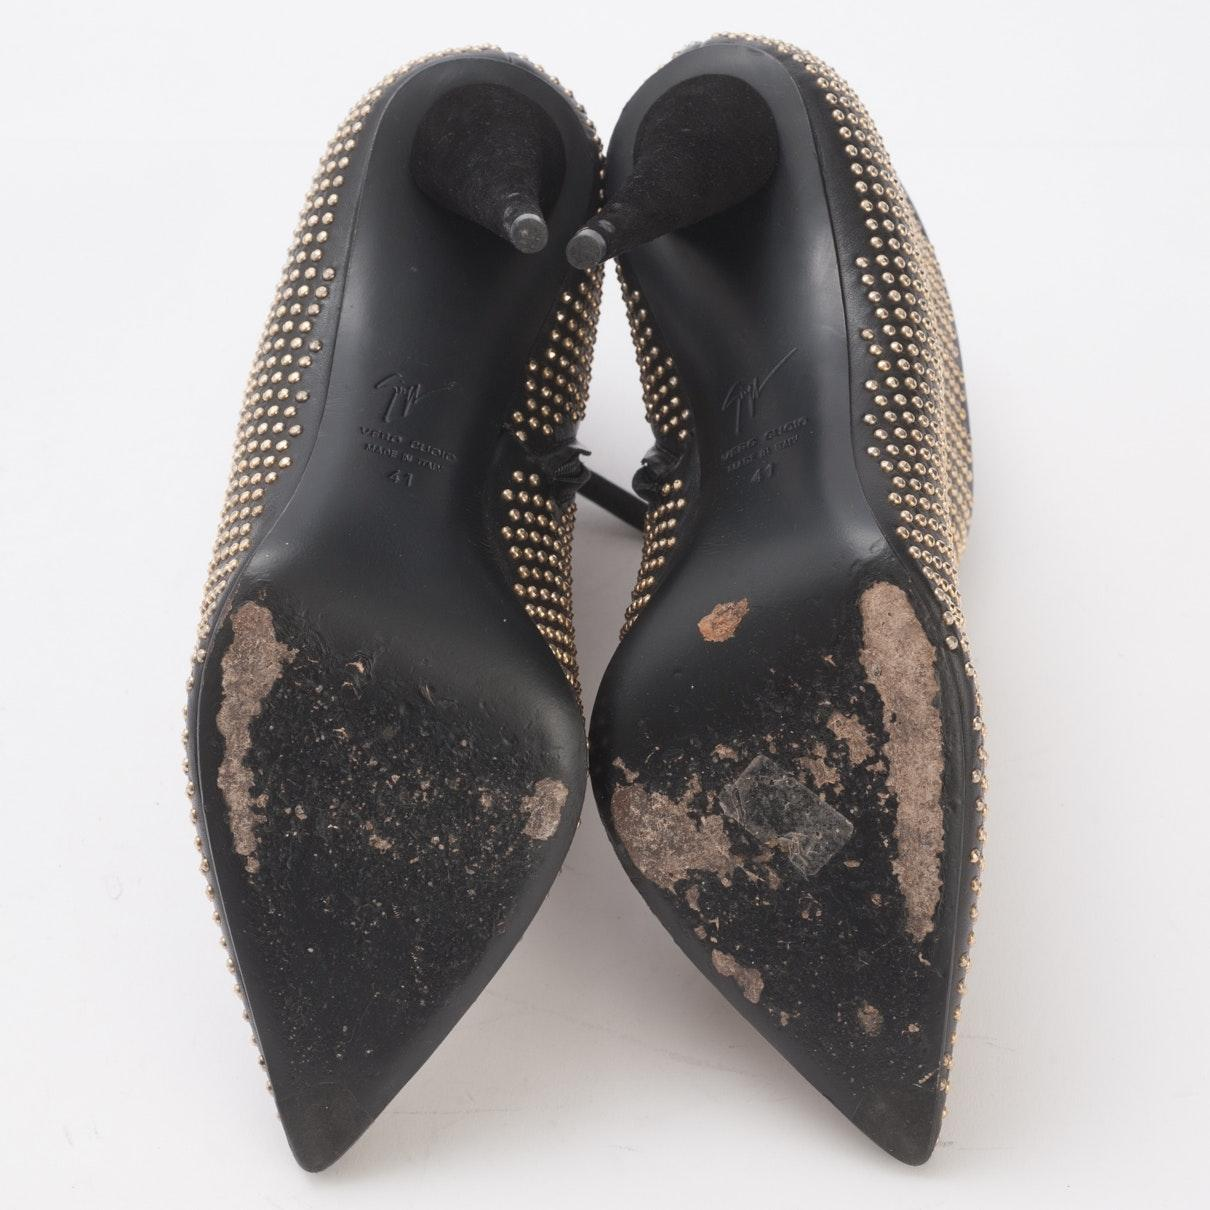 Botines en cuero negro N Giuseppe Zanotti de Cuero de color Negro